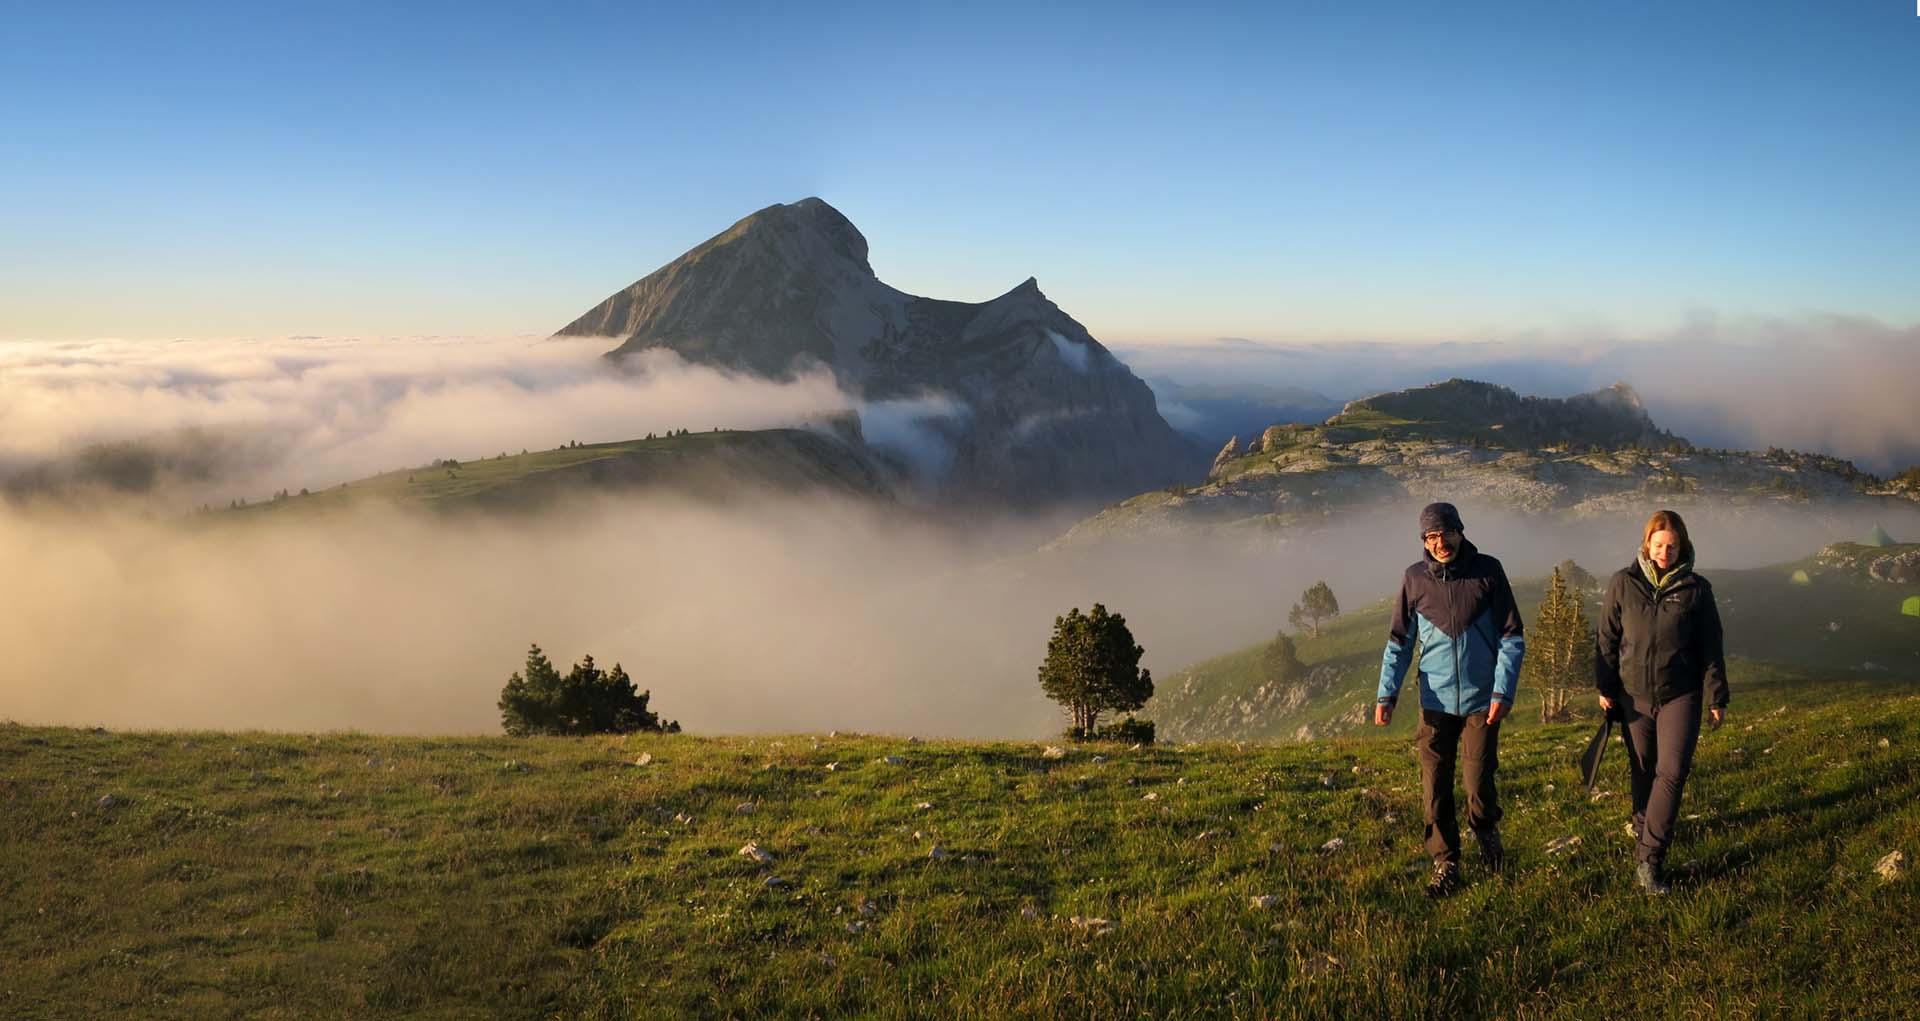 Bivouac Tente Tipi Bachassons Brouillard Grand Veymont Hauts Plateaux Vercors Itinerance Sejour Trek Tente Slow Rando